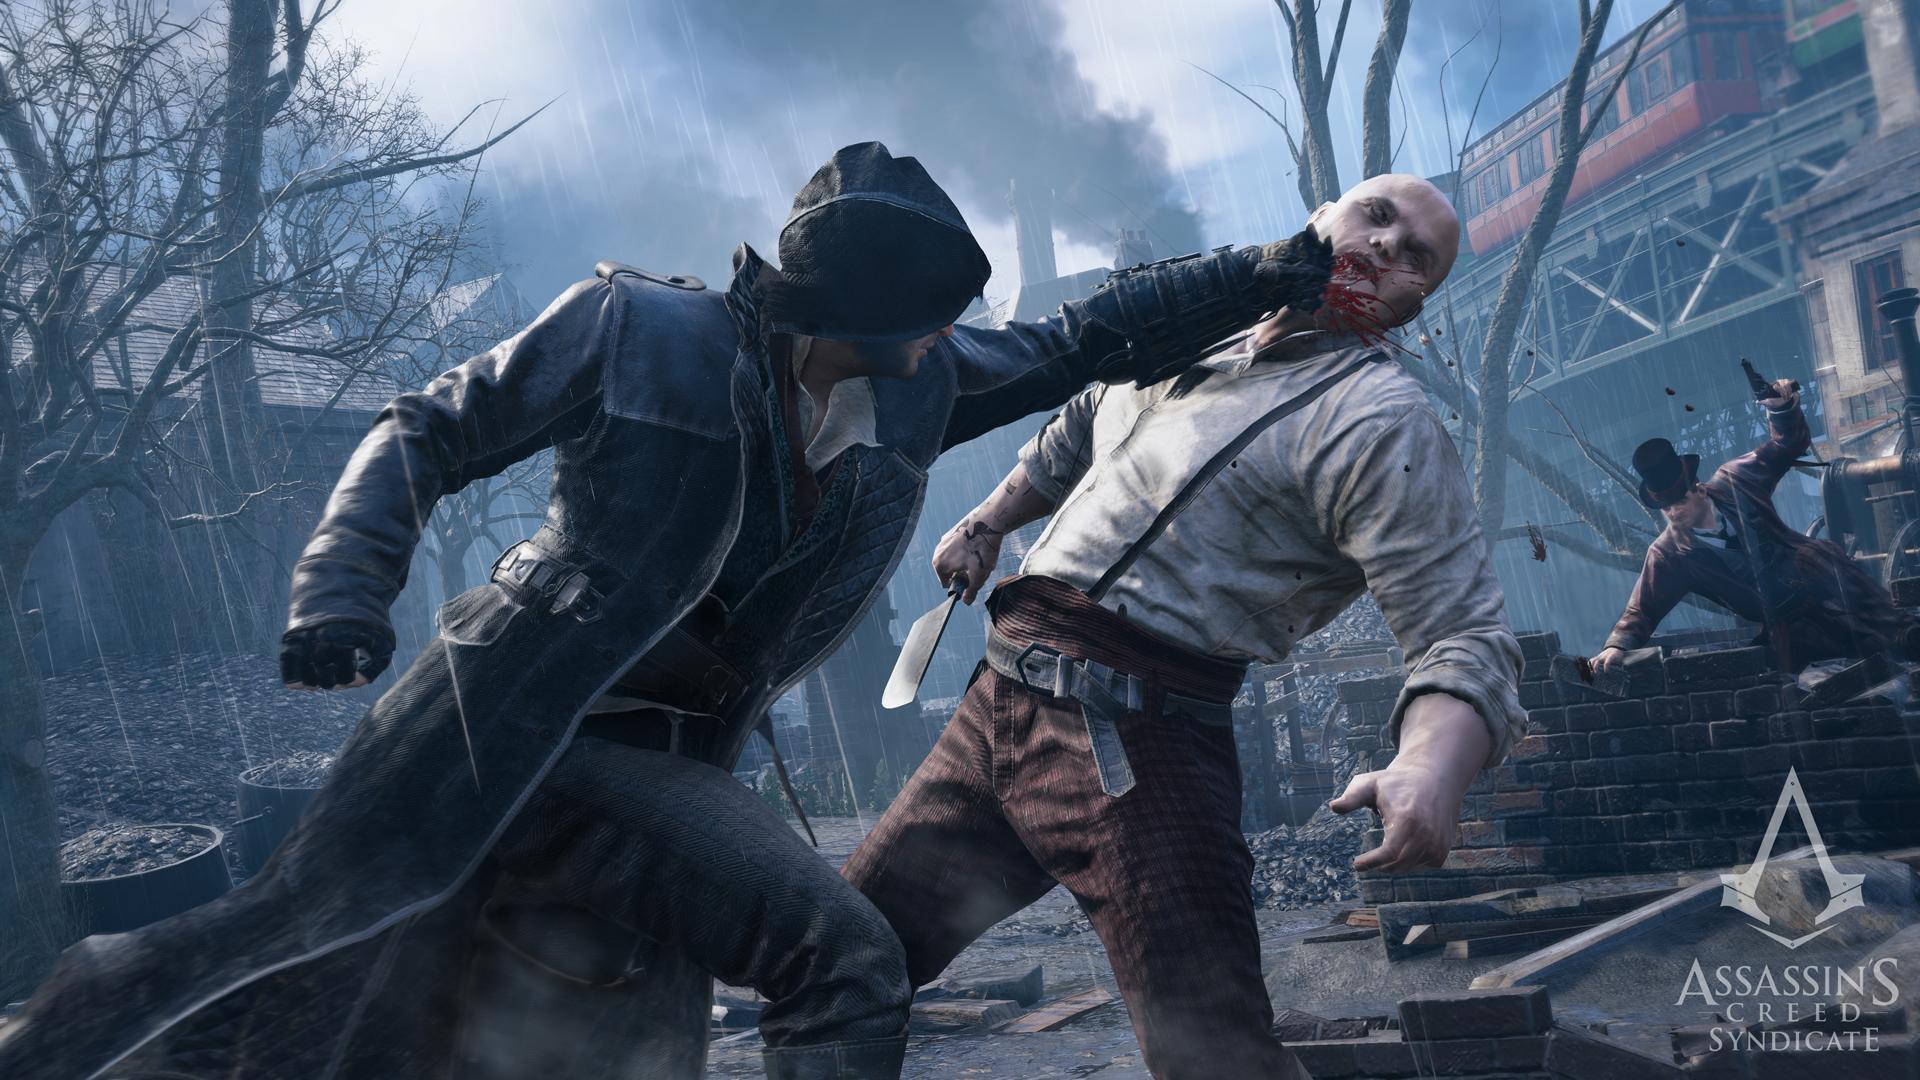 Assassin'S Creed Syndicate ESPAÑOL PC Full + Update v1.21 (CODEX) + REPACK 6 DVD5 (JPW) 1